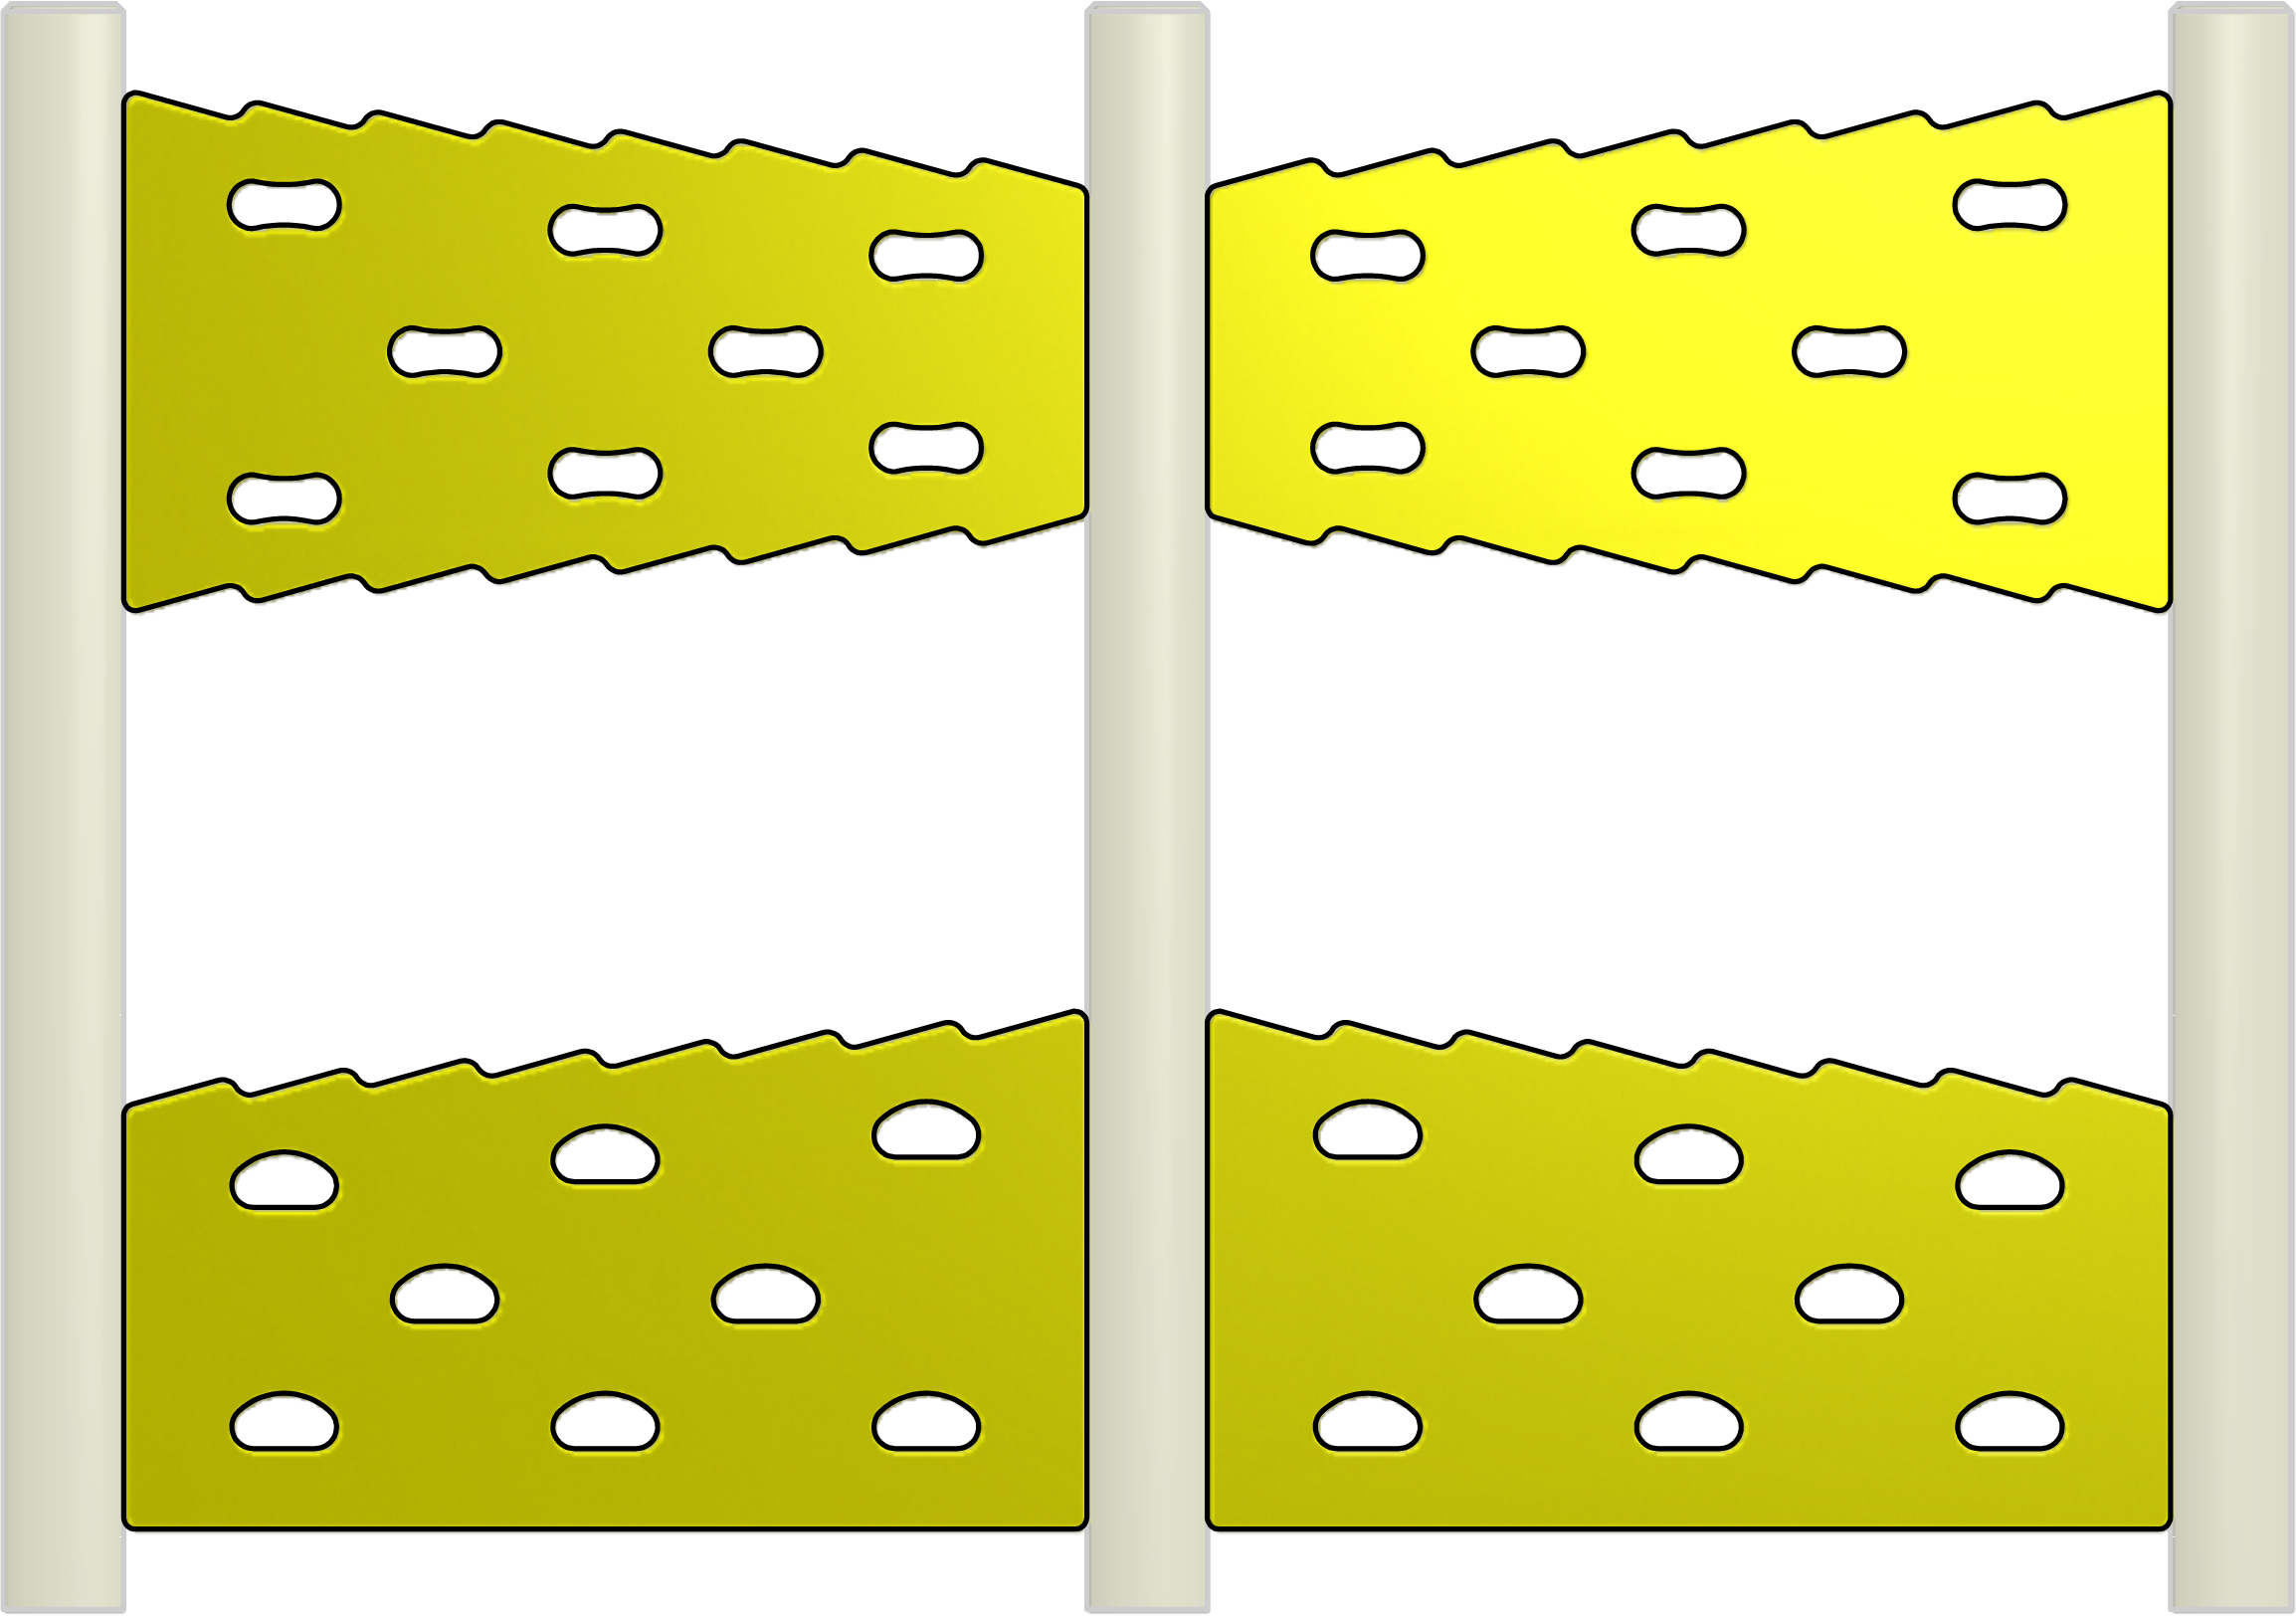 Straight Zig-Zag Spilt Traverse Wall